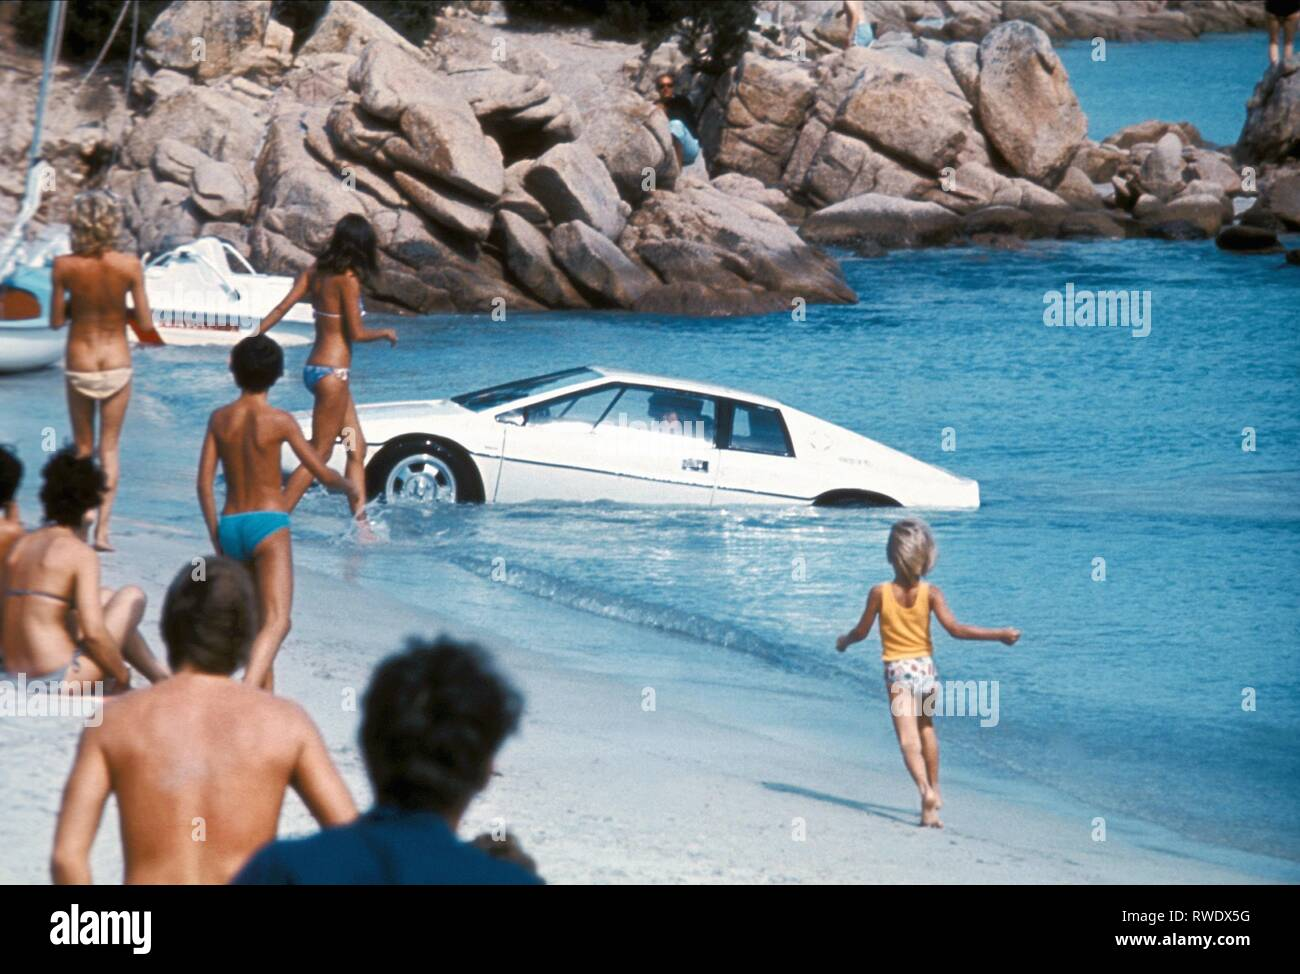 UNDERWATER LOTUS ESPRIT,  THE SPY WHO LOVED ME, 1977 - Stock Image